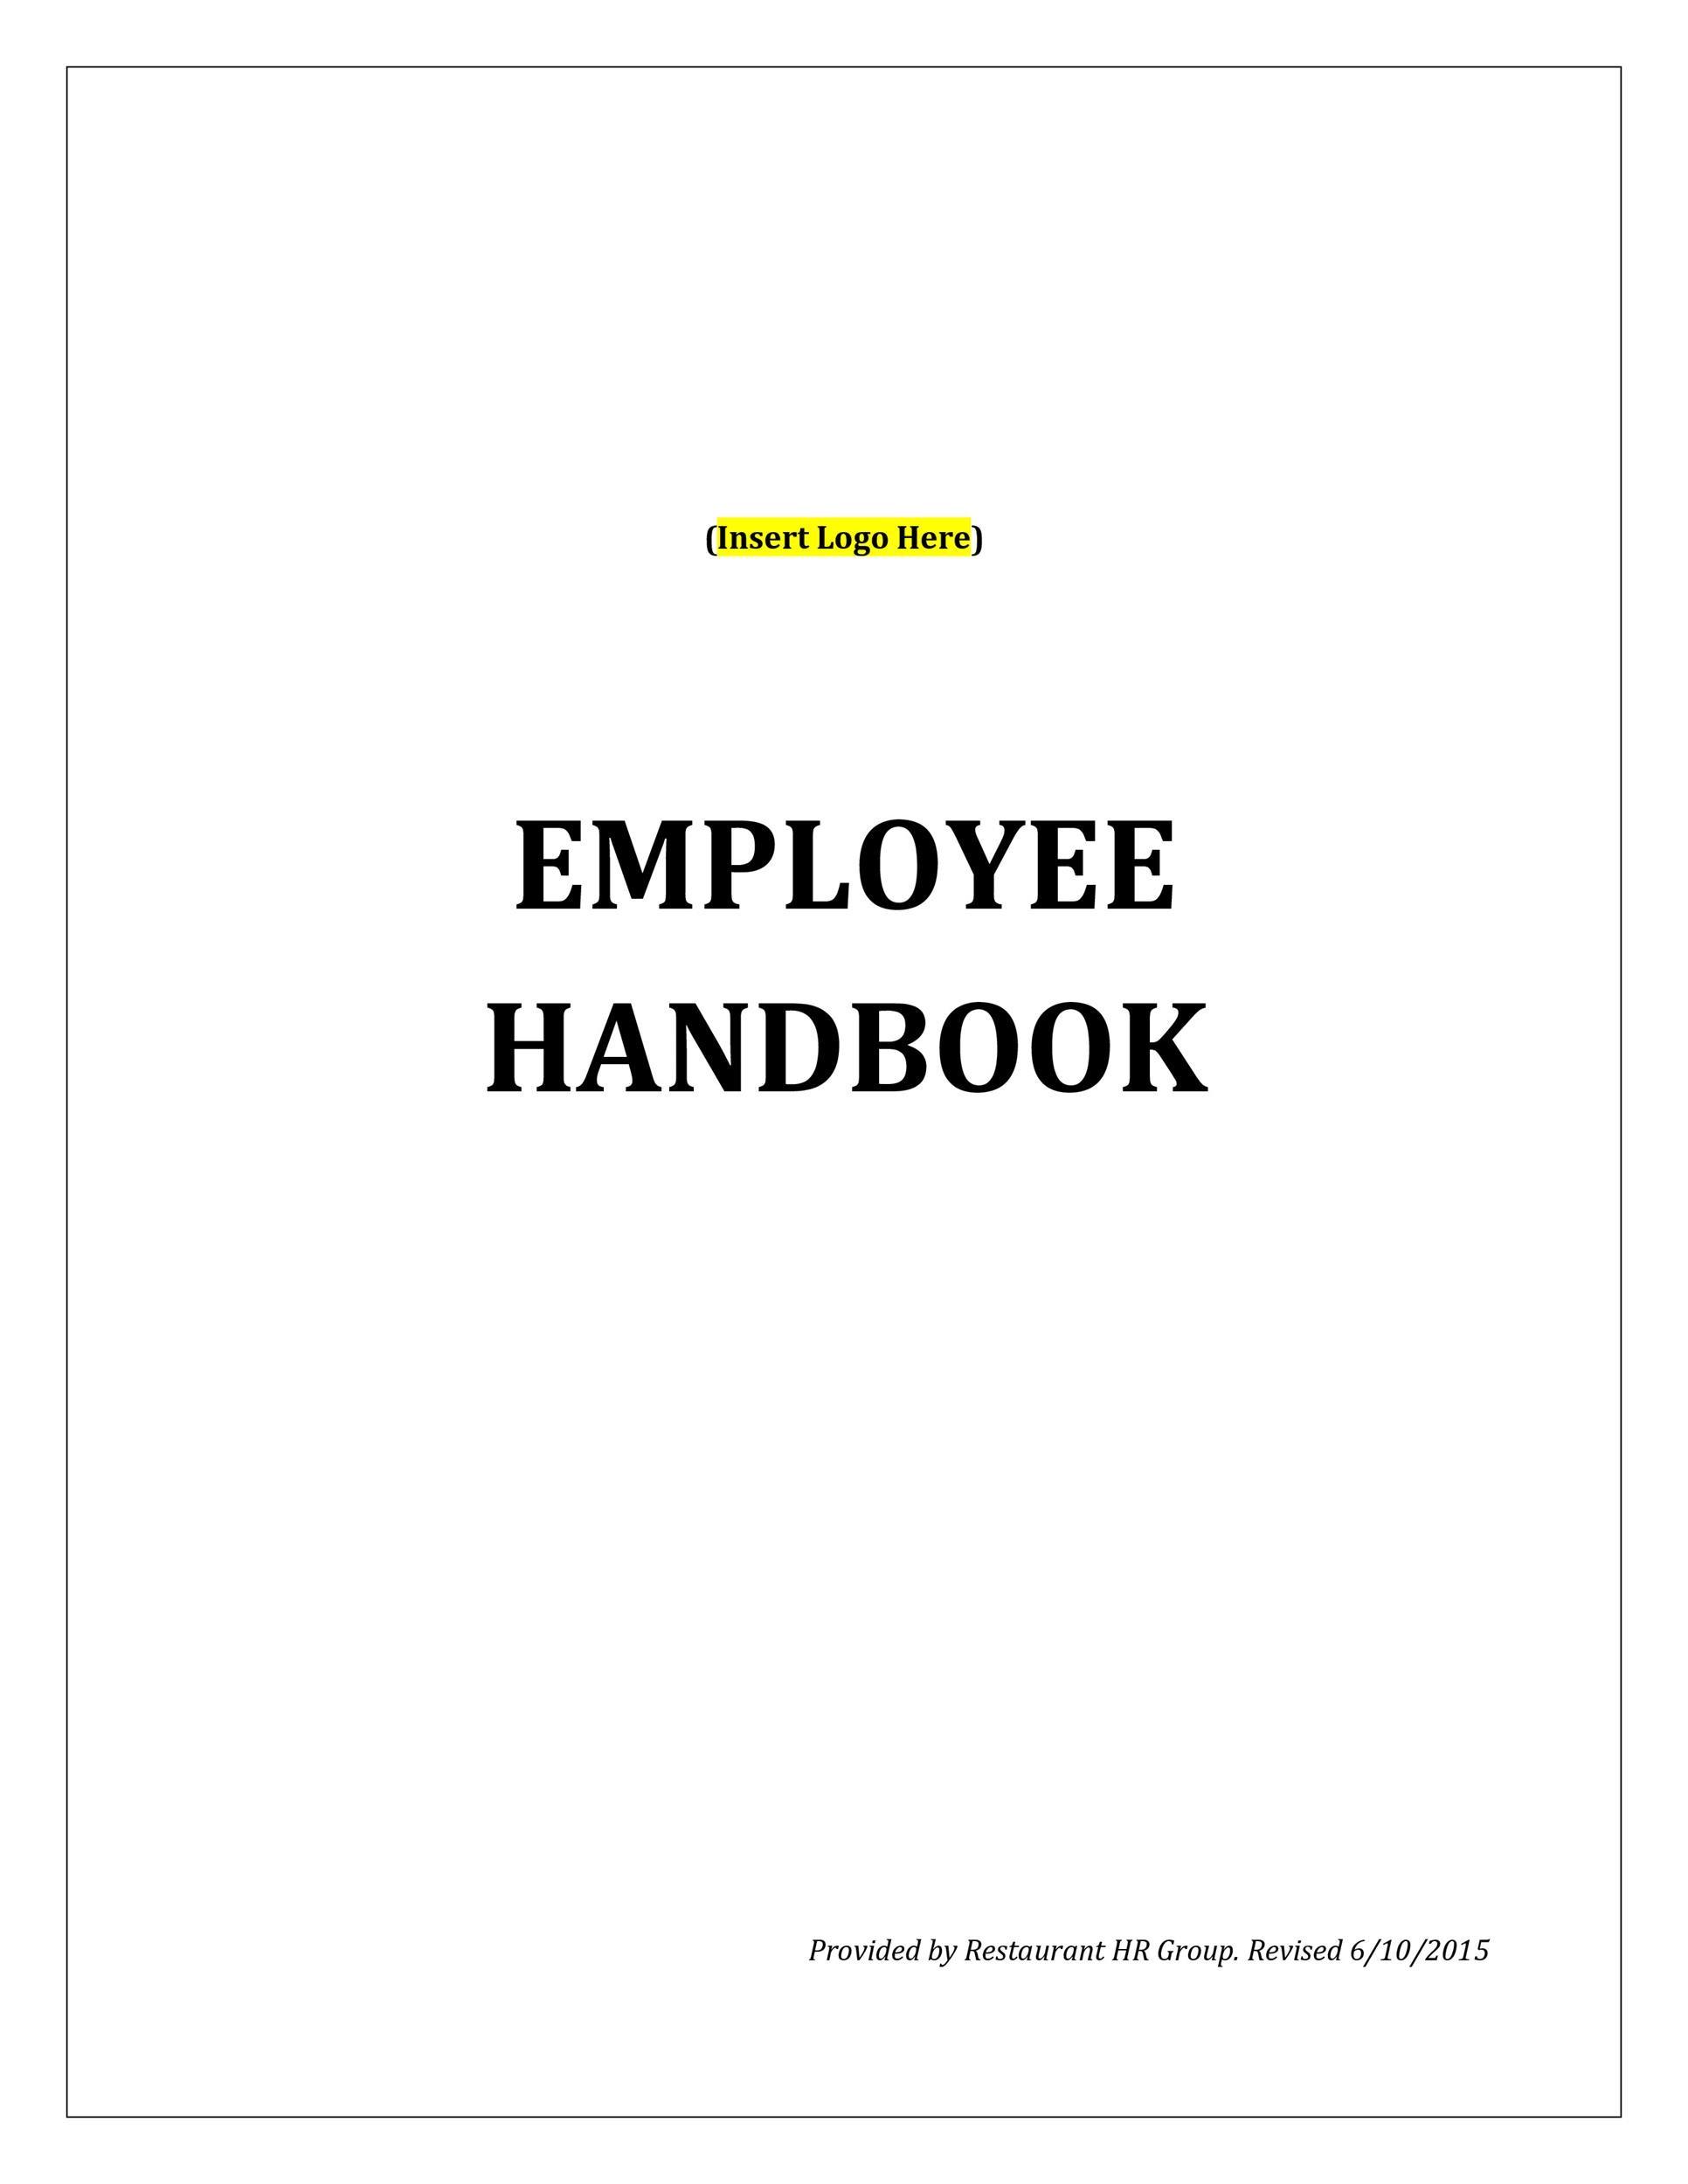 Free employee handbook template 05